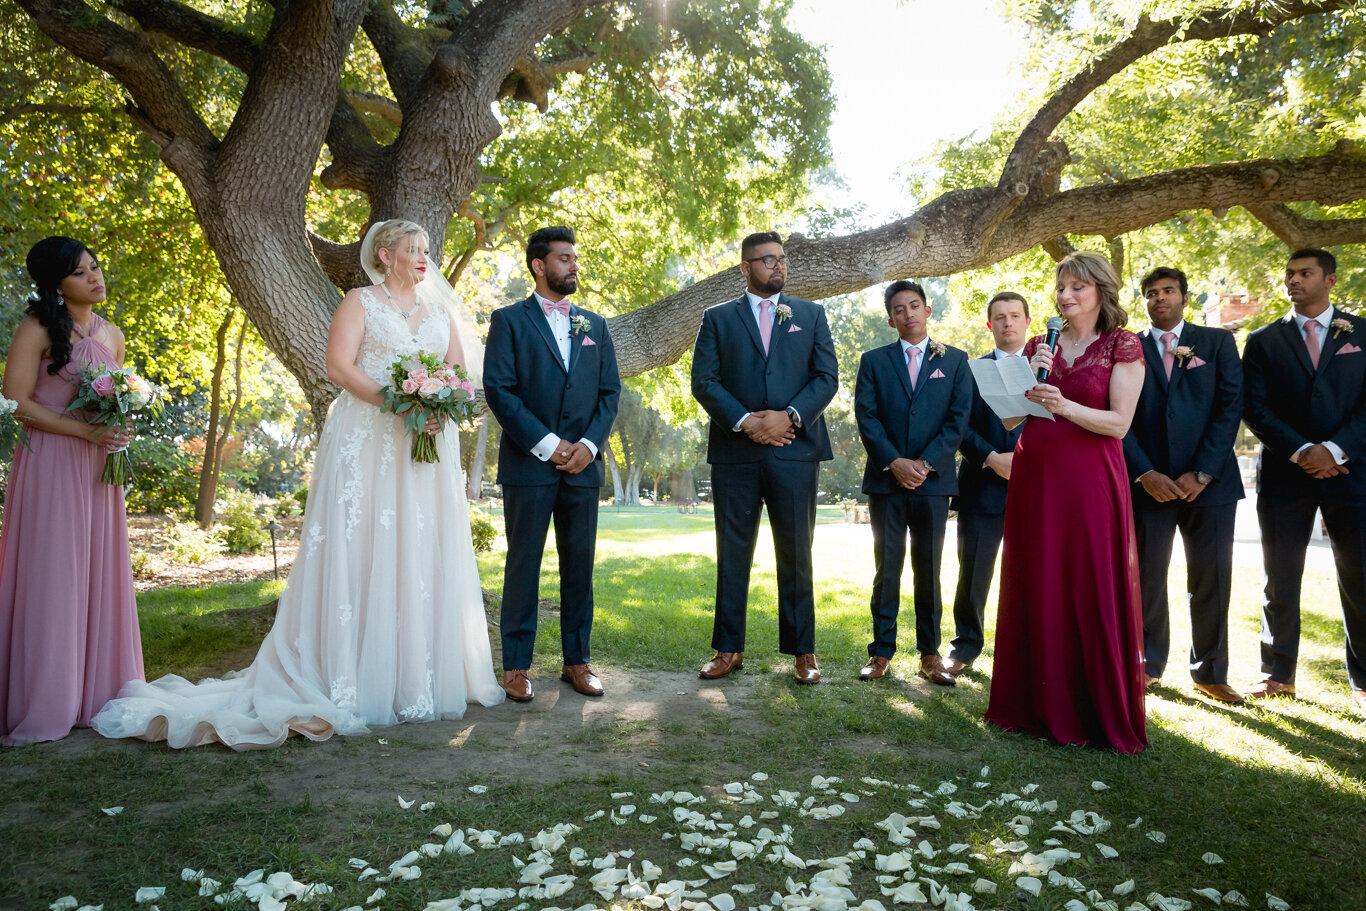 2019.08.24_Emily-Ashir-Wedding-at-the-Maples-5818.jpg